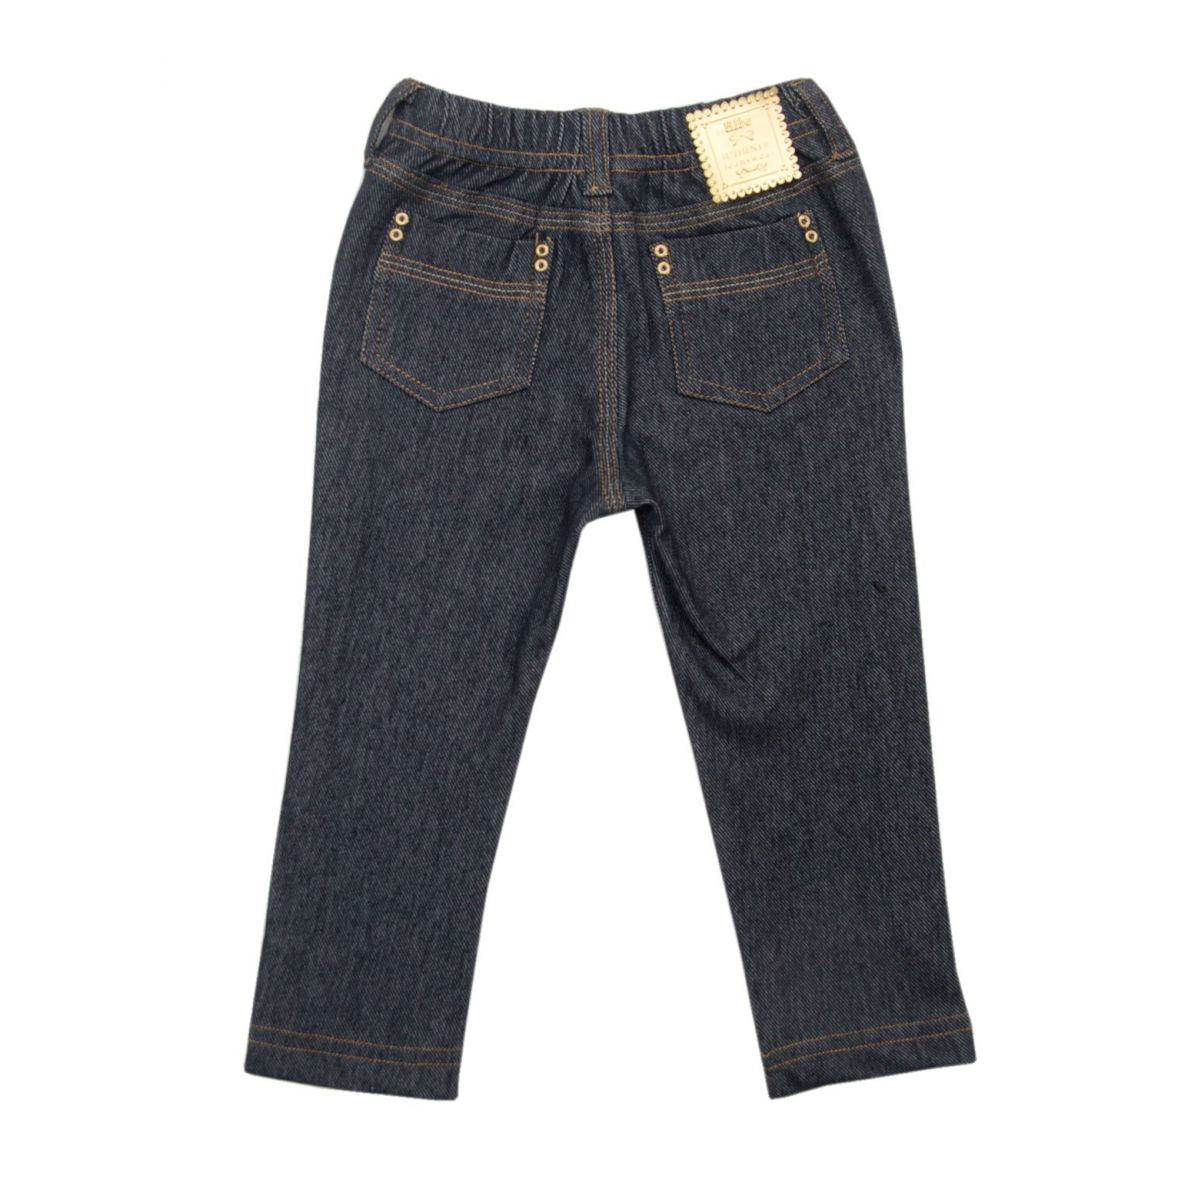 Calça Feminina Skinny Jeans Blue